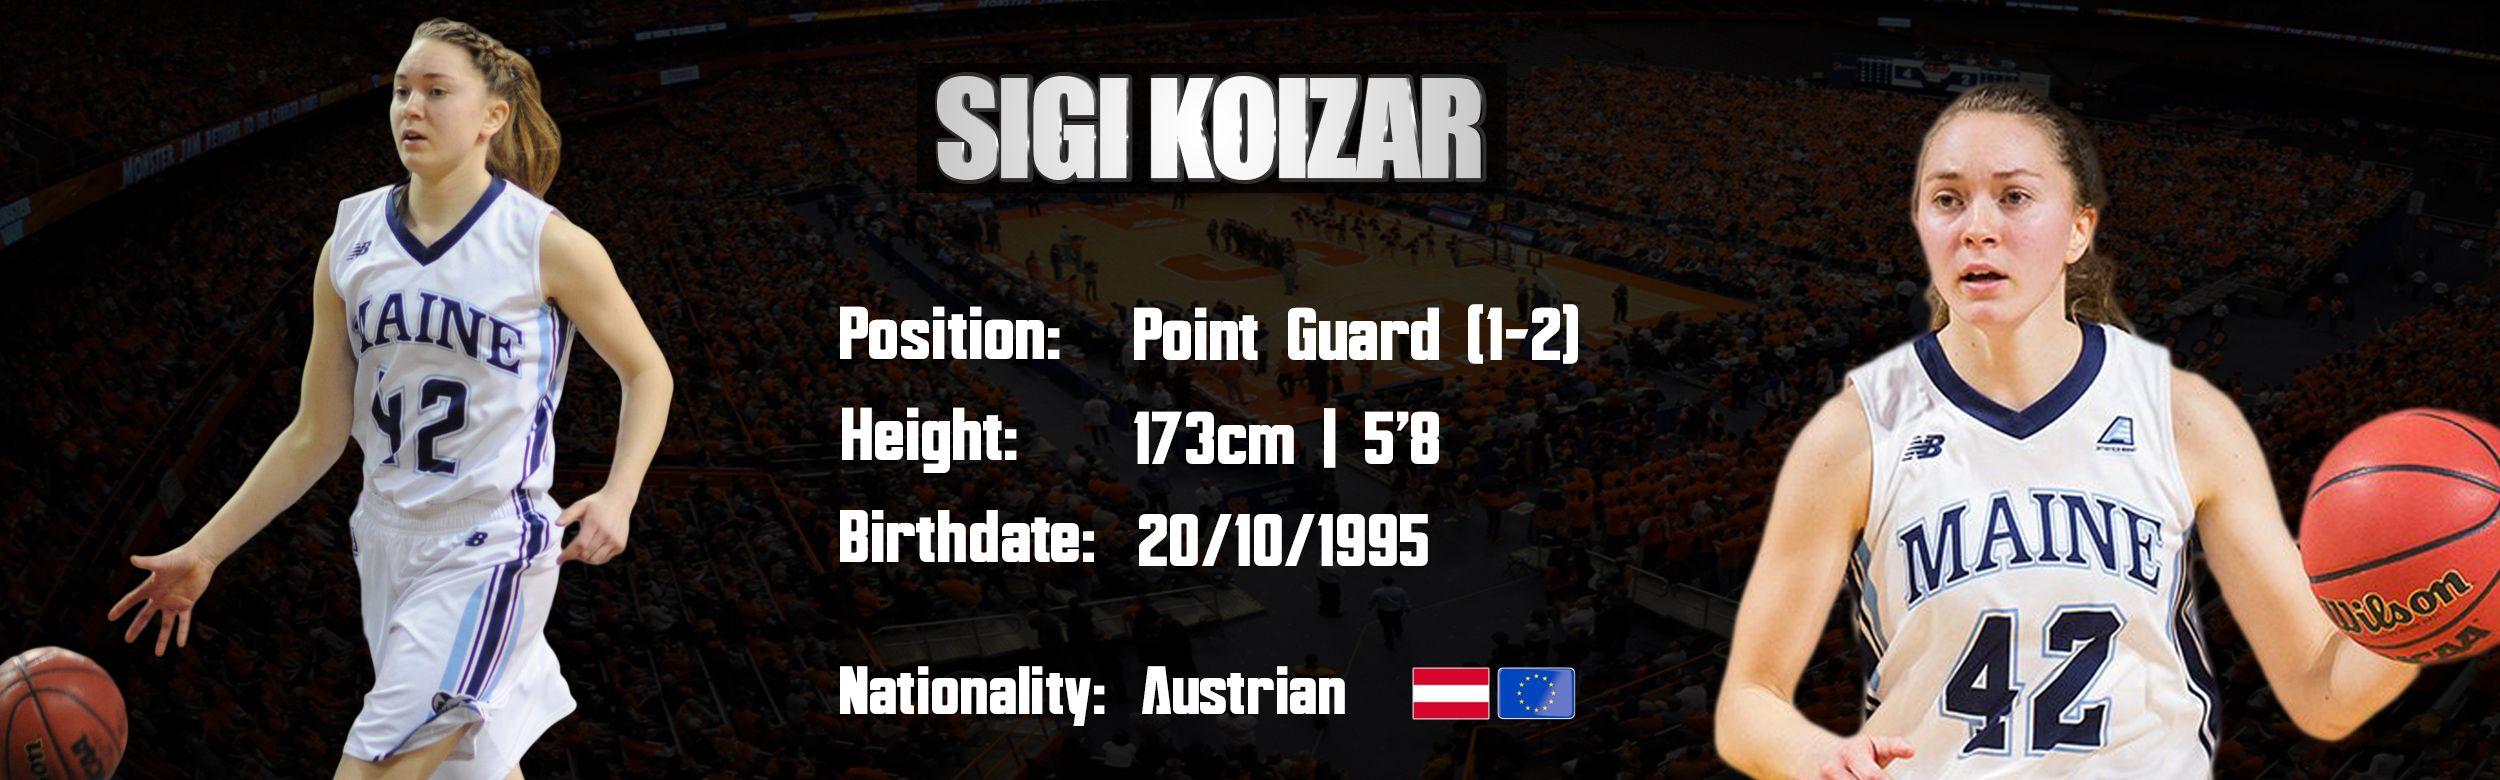 Sigi Koizar